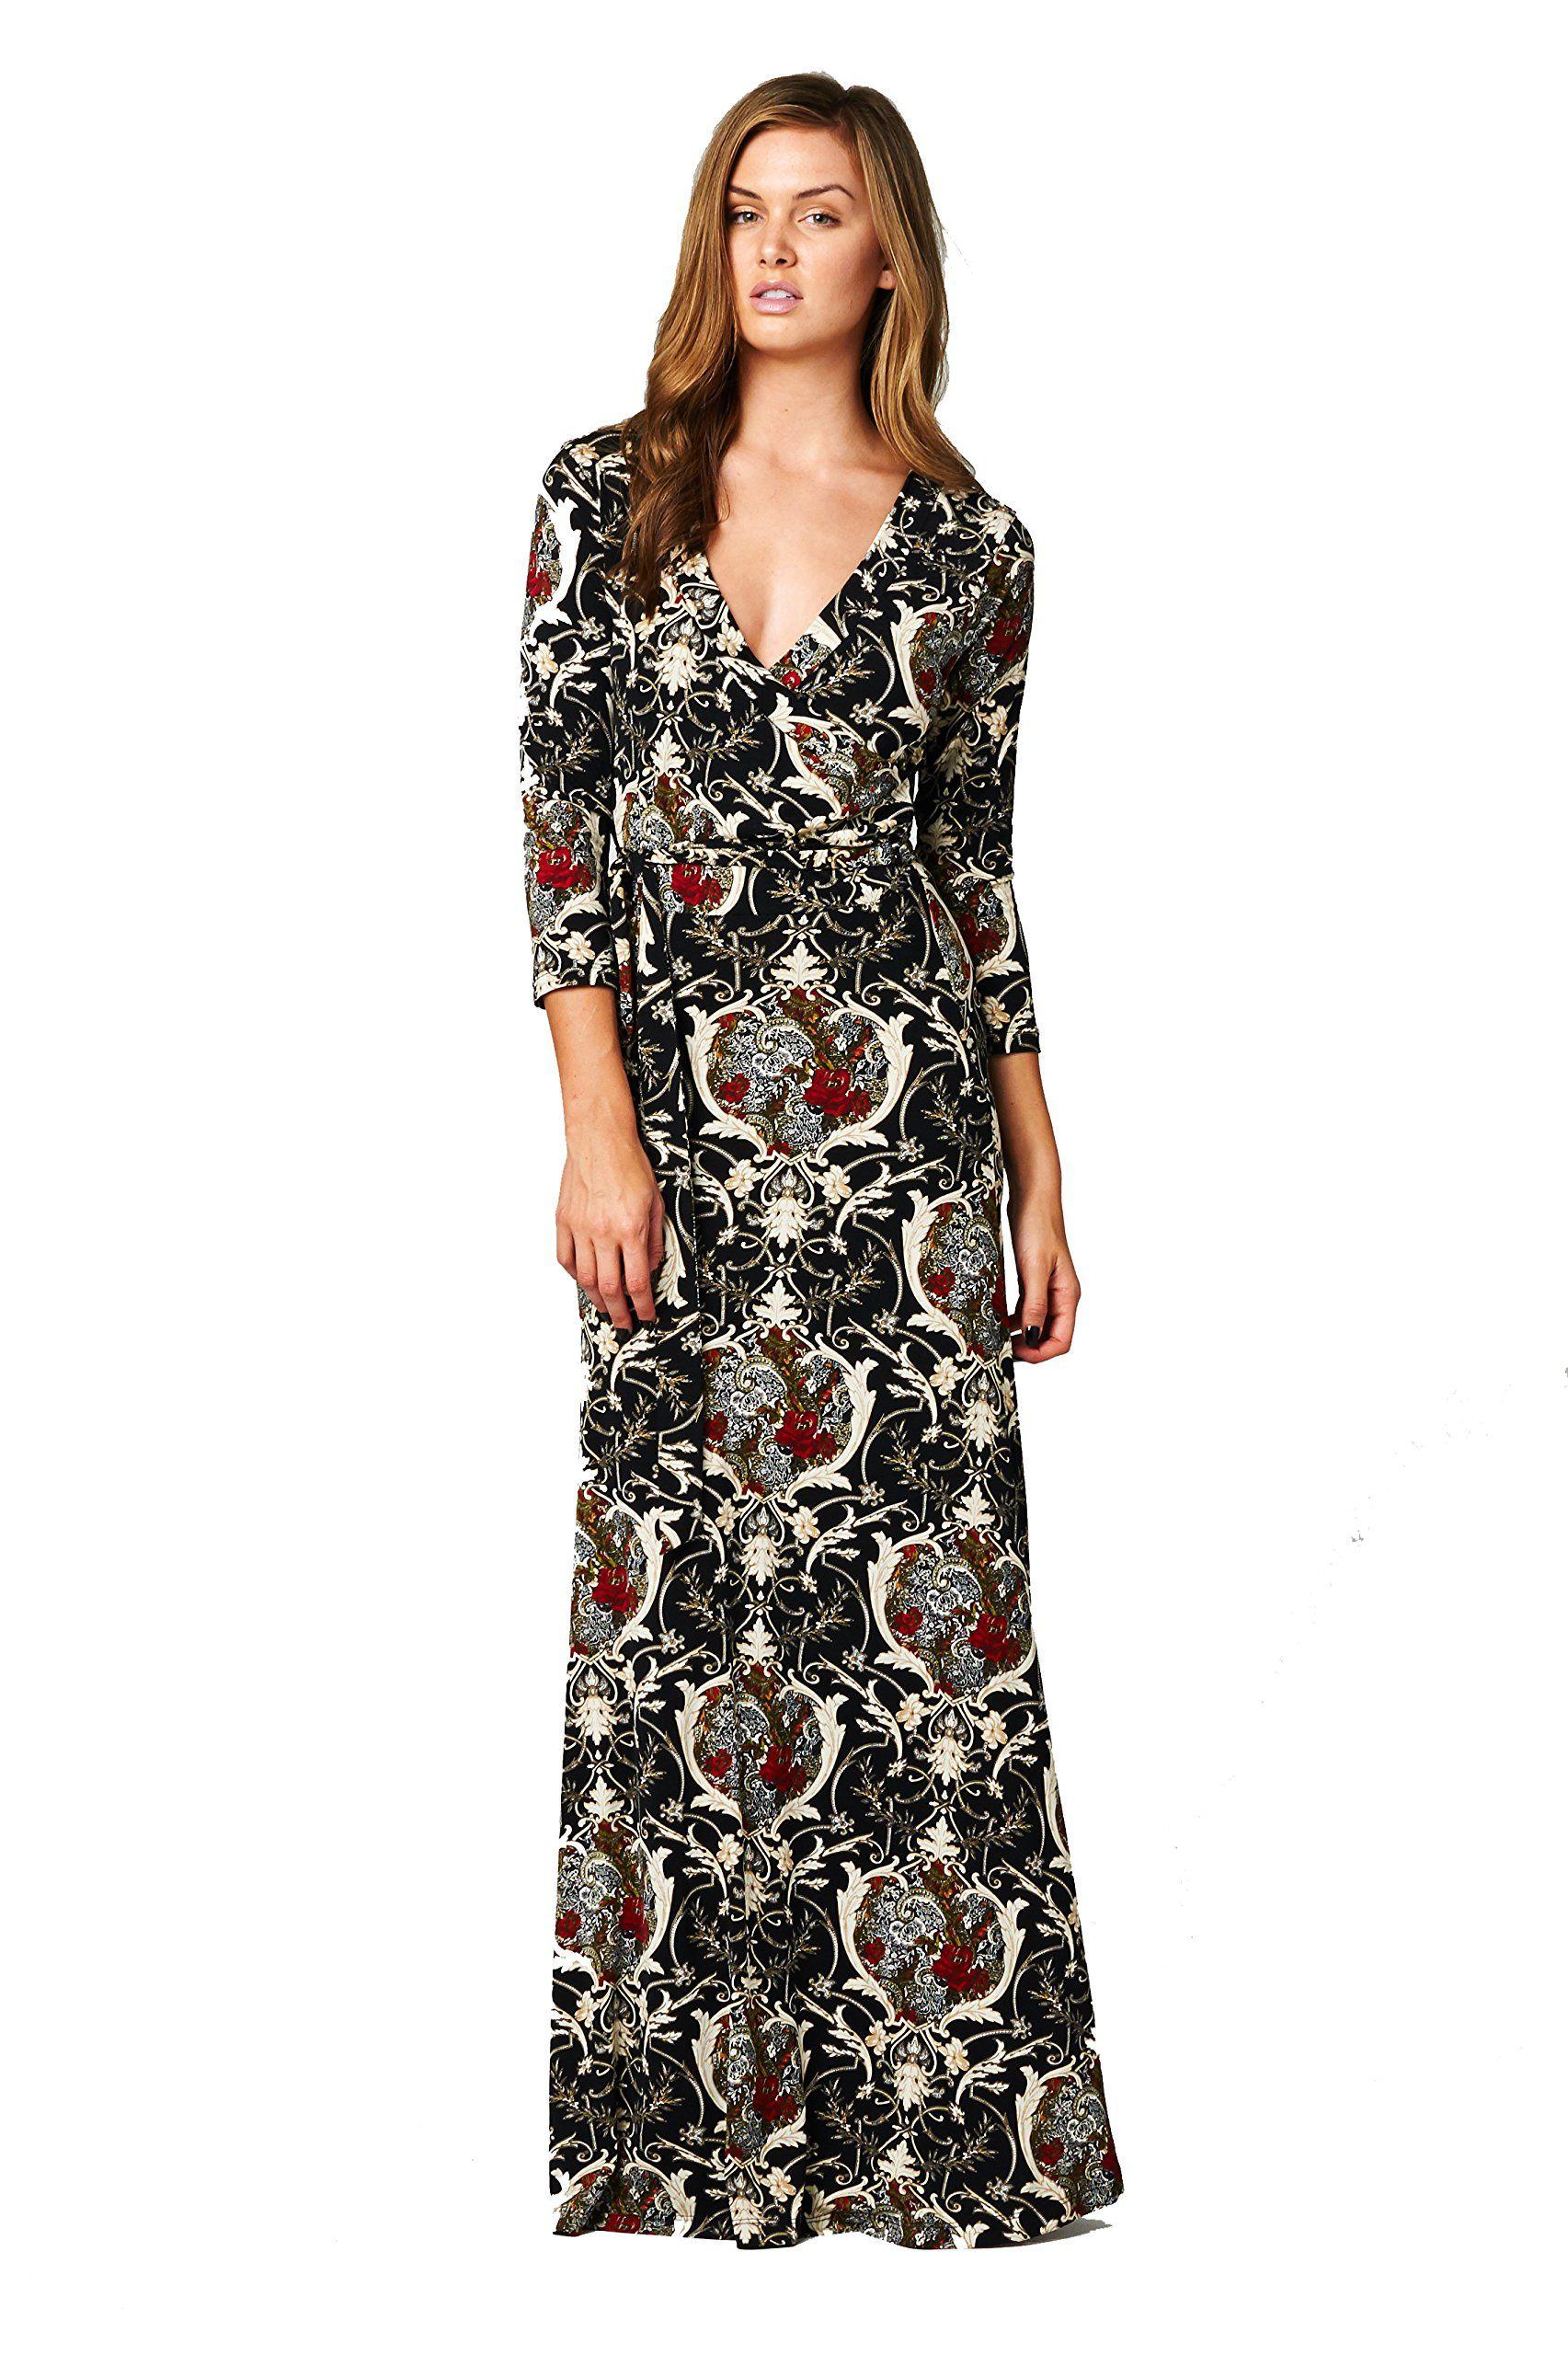 On trend paris dress baroque bohemian sleeve long maxi dress